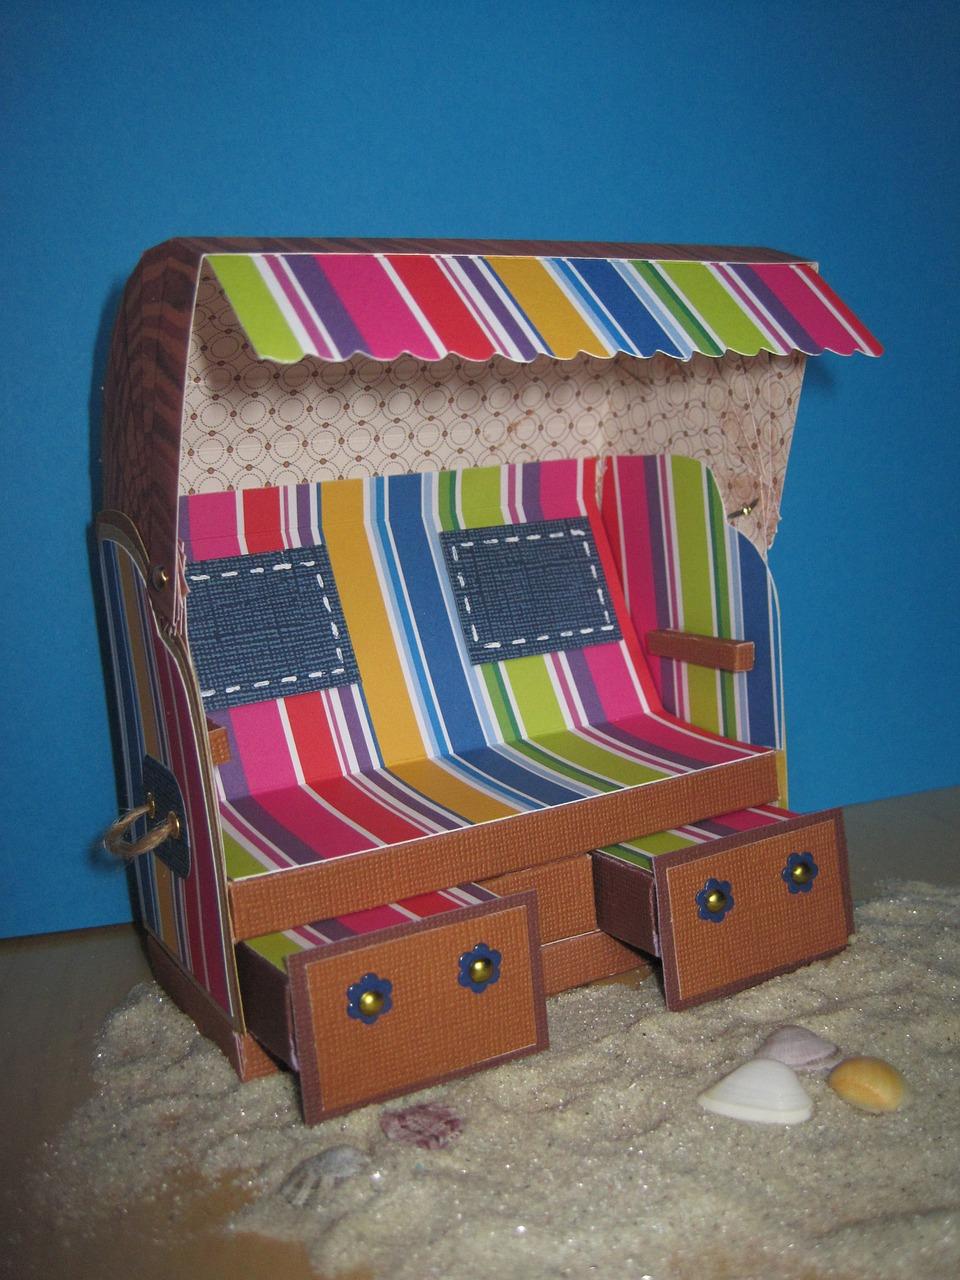 Meubles En Carton Pour Home Staging charlotte labarre – page 4 – conseils homestaging